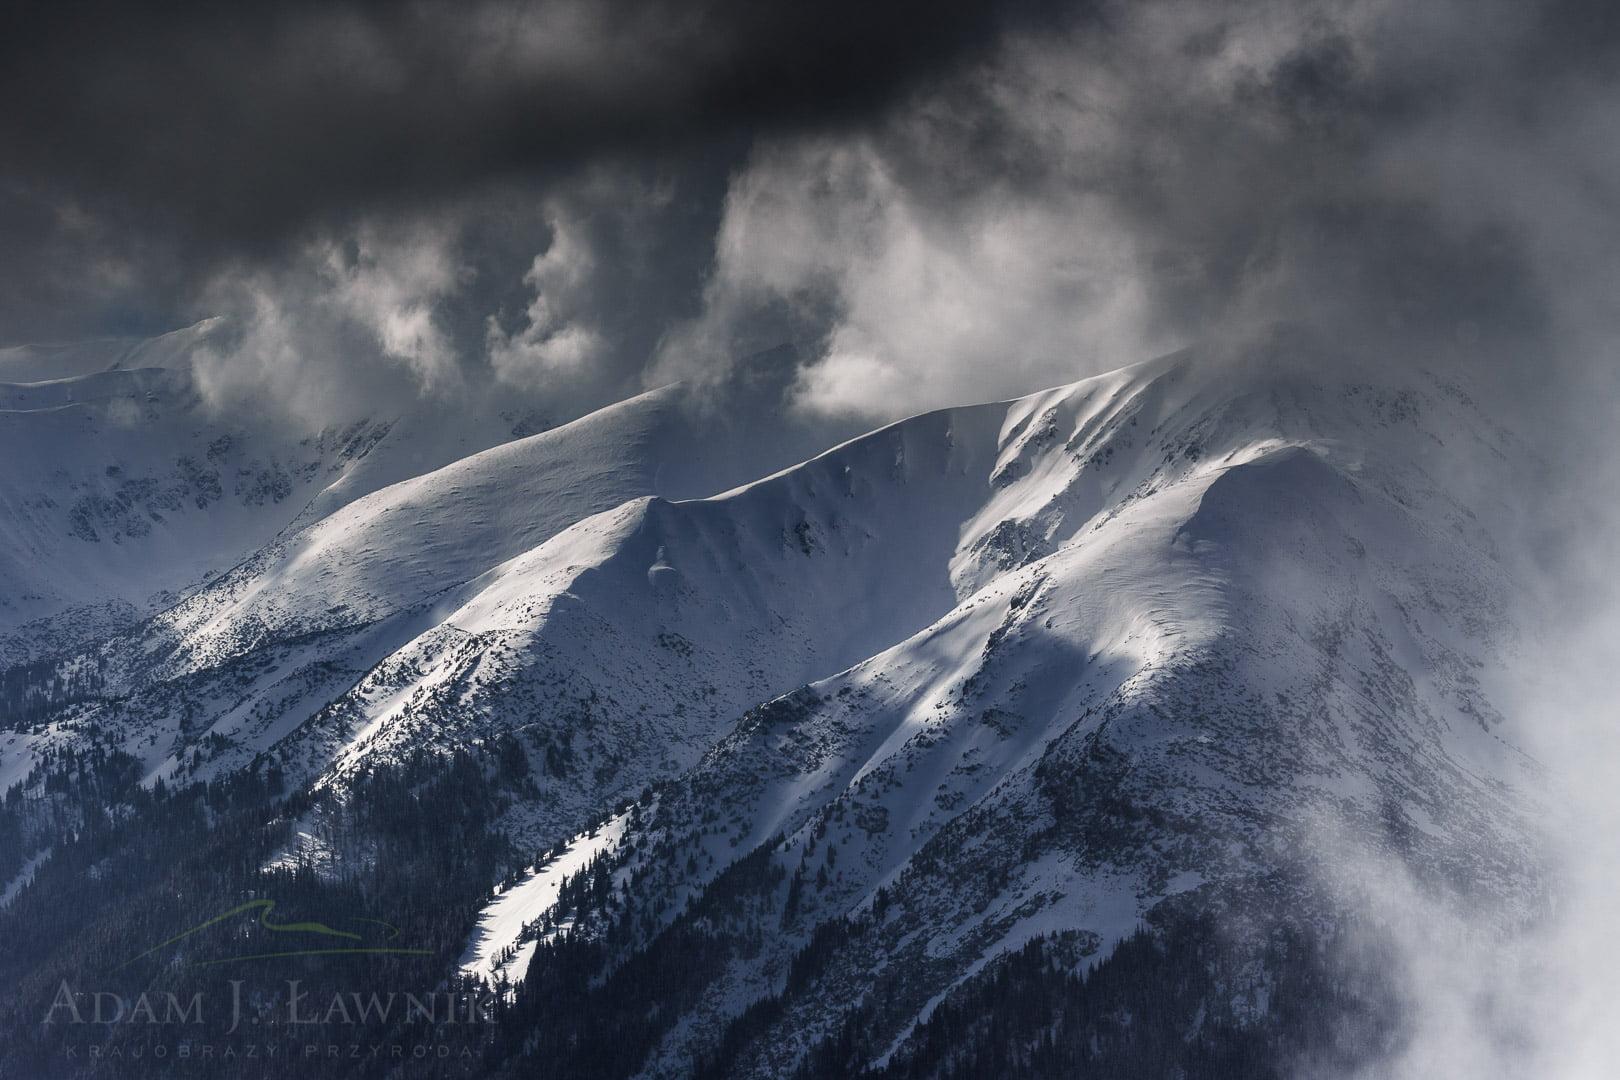 Tatra National Park, Poland 1602-00070C